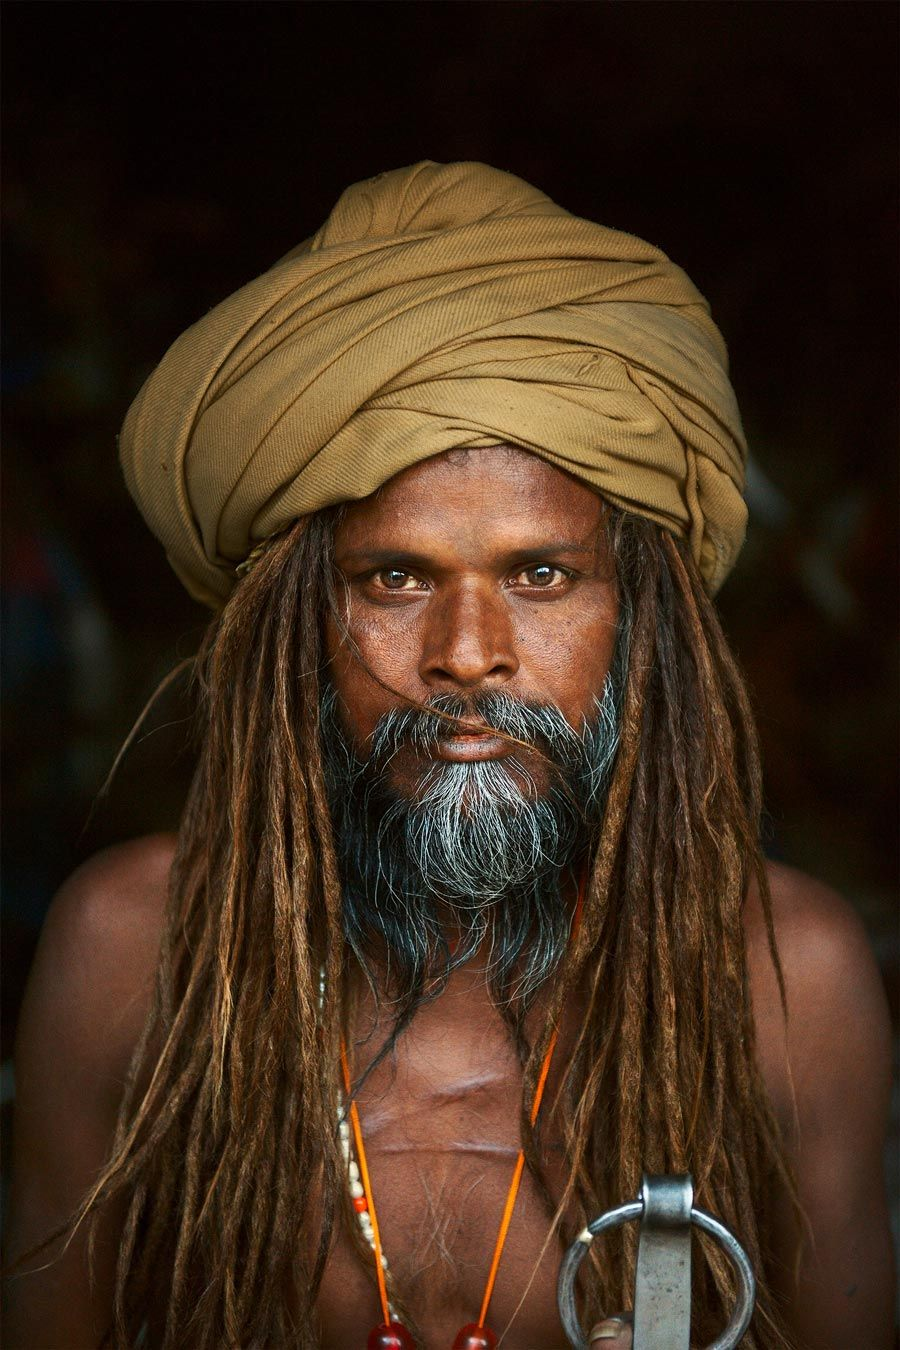 Famous Steves regarding haridwar, india during kumbh mela | we, the people | pinterest